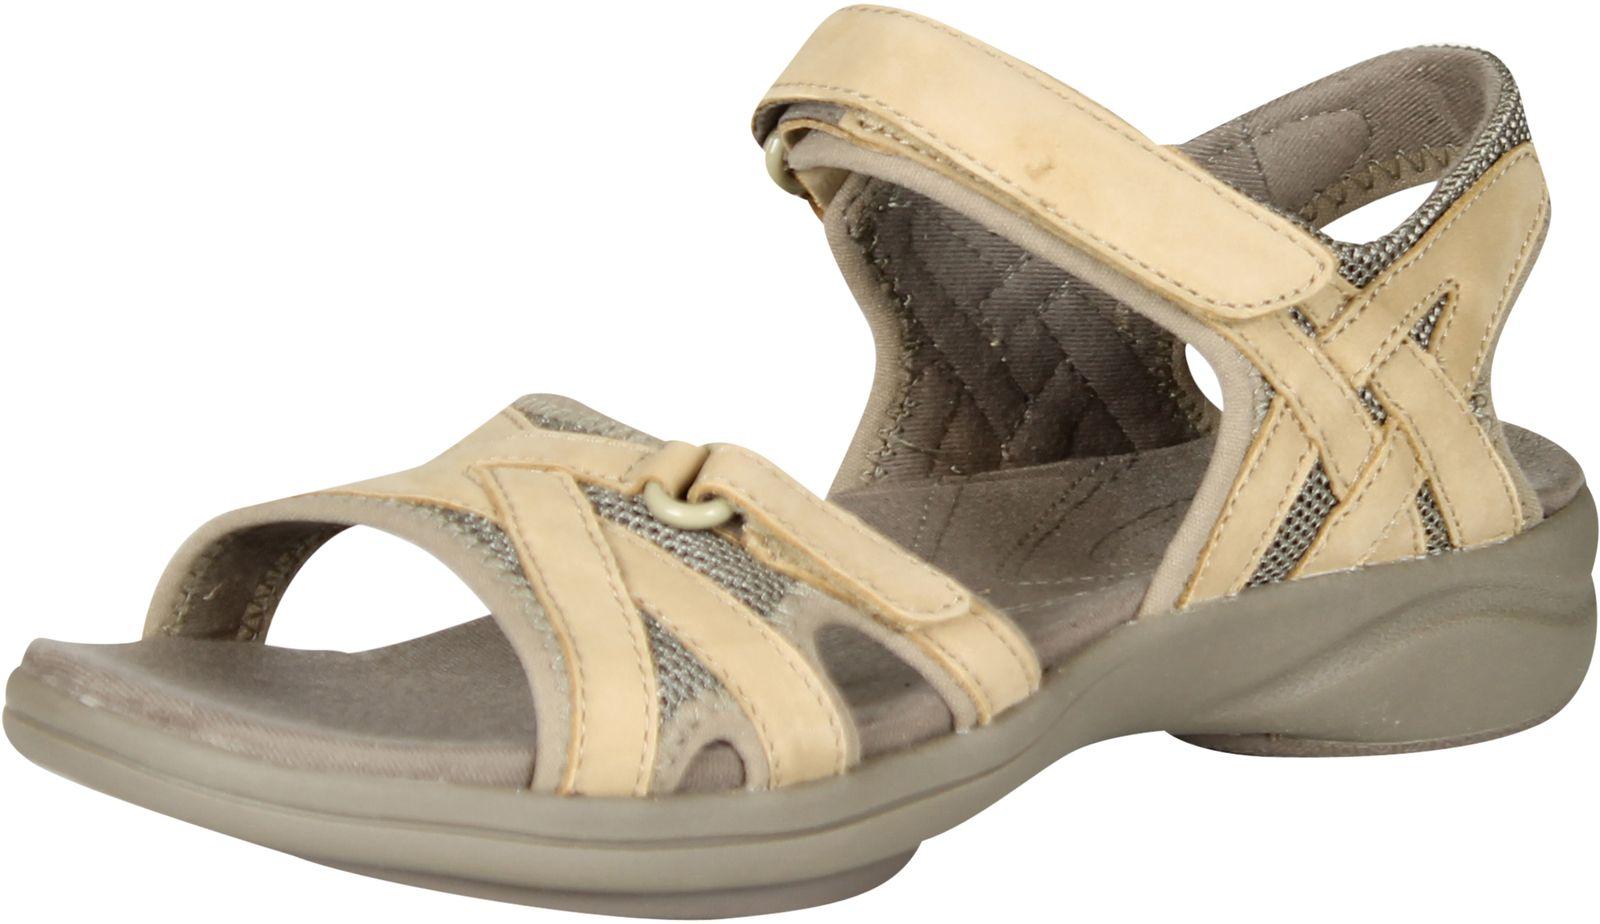 Clarks Womens In-Motion Peak Sandals